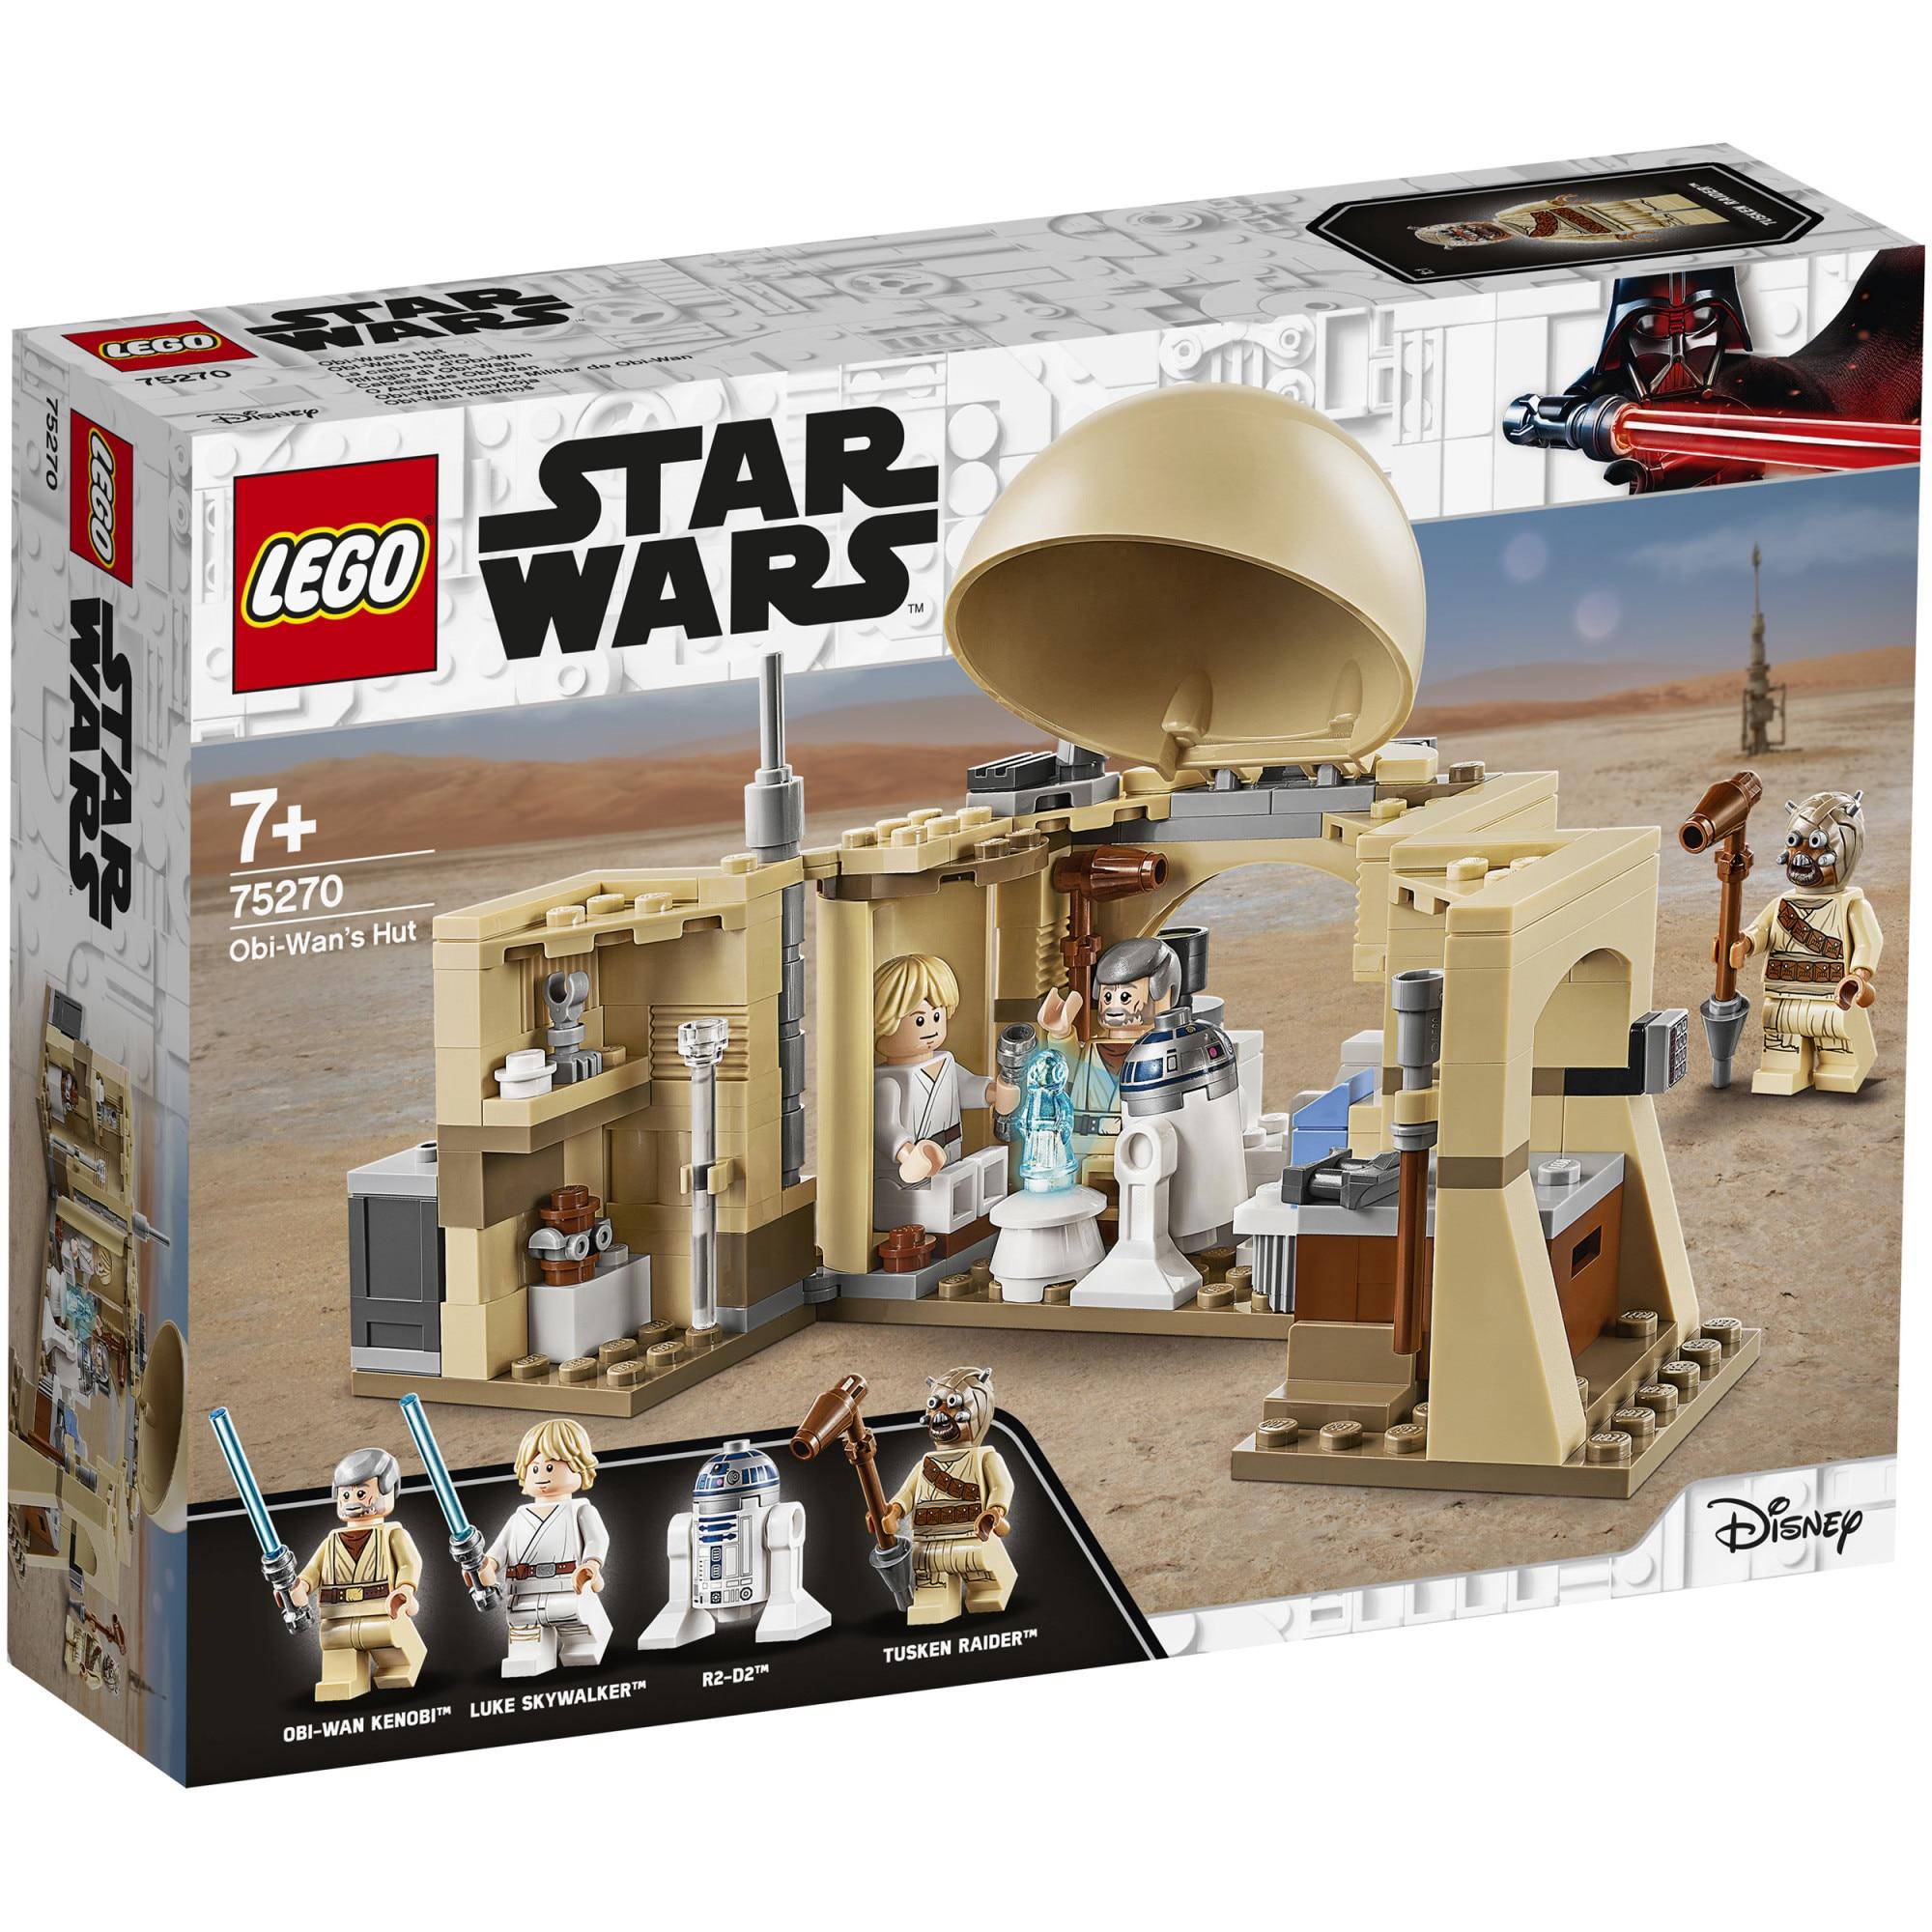 Fotografie LEGO Star Wars - Coliba lui Obi Wan 75270, 200 piese